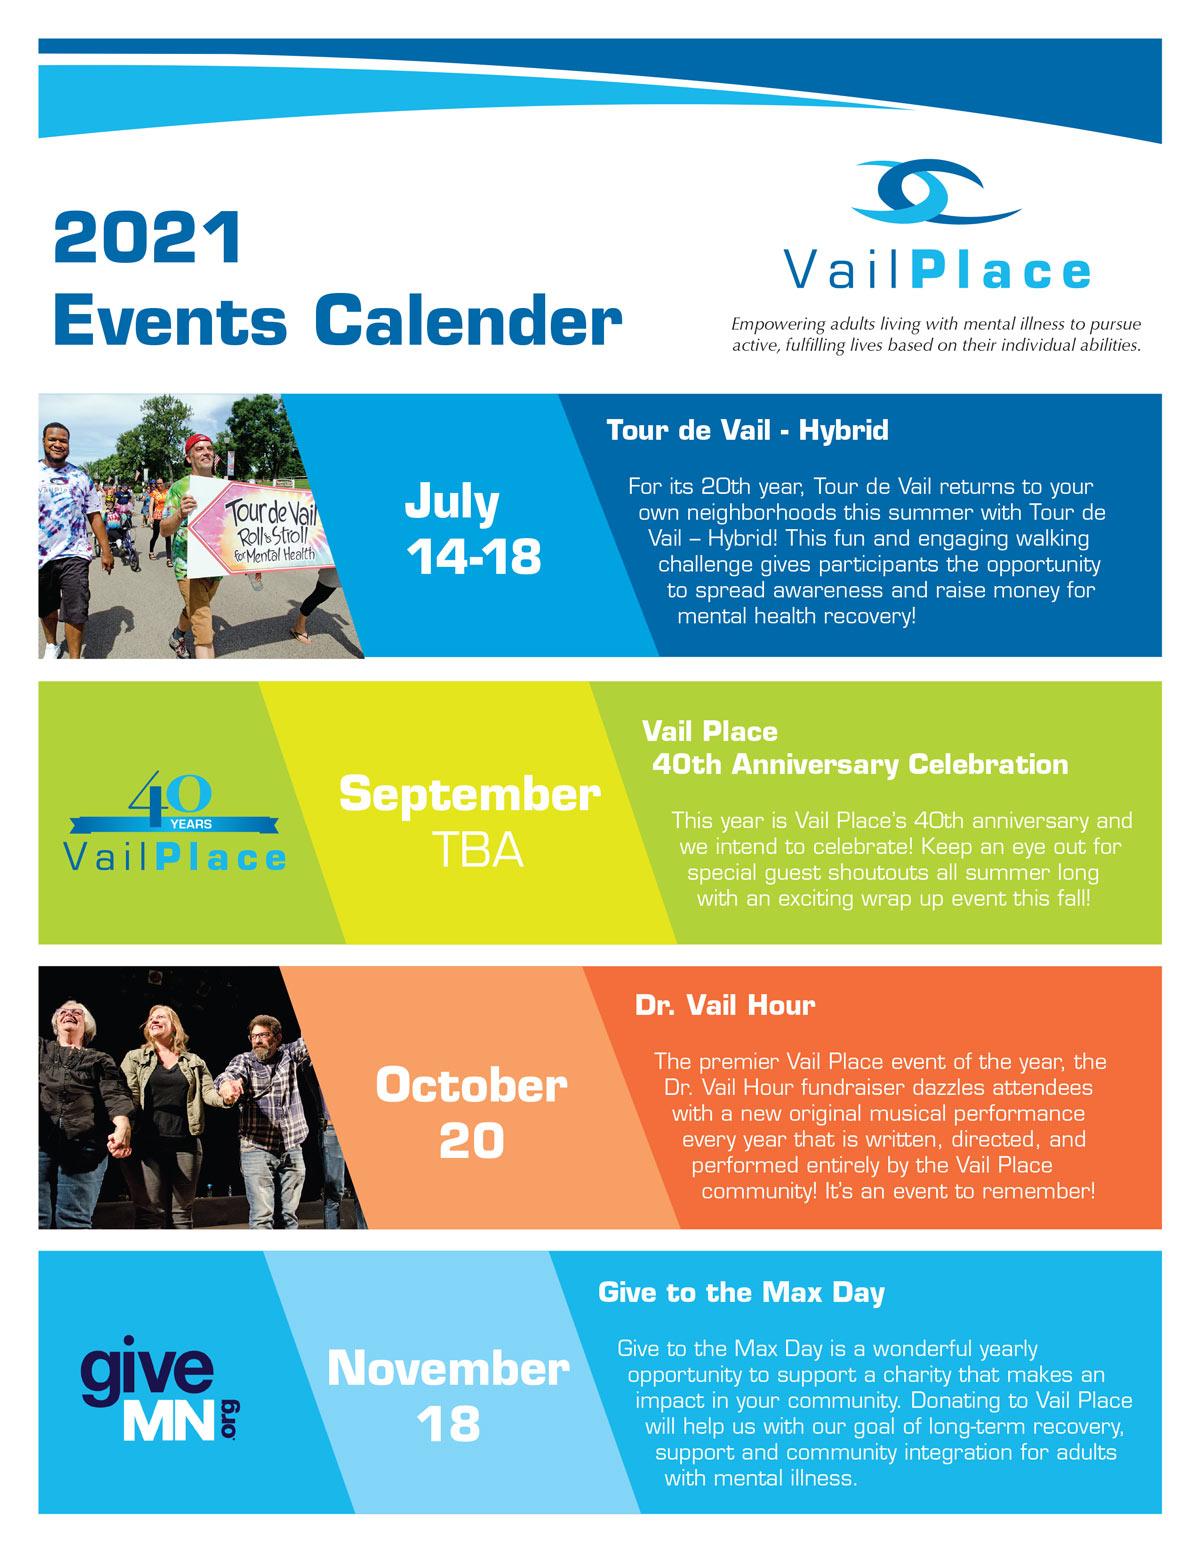 2021 Events Calendar